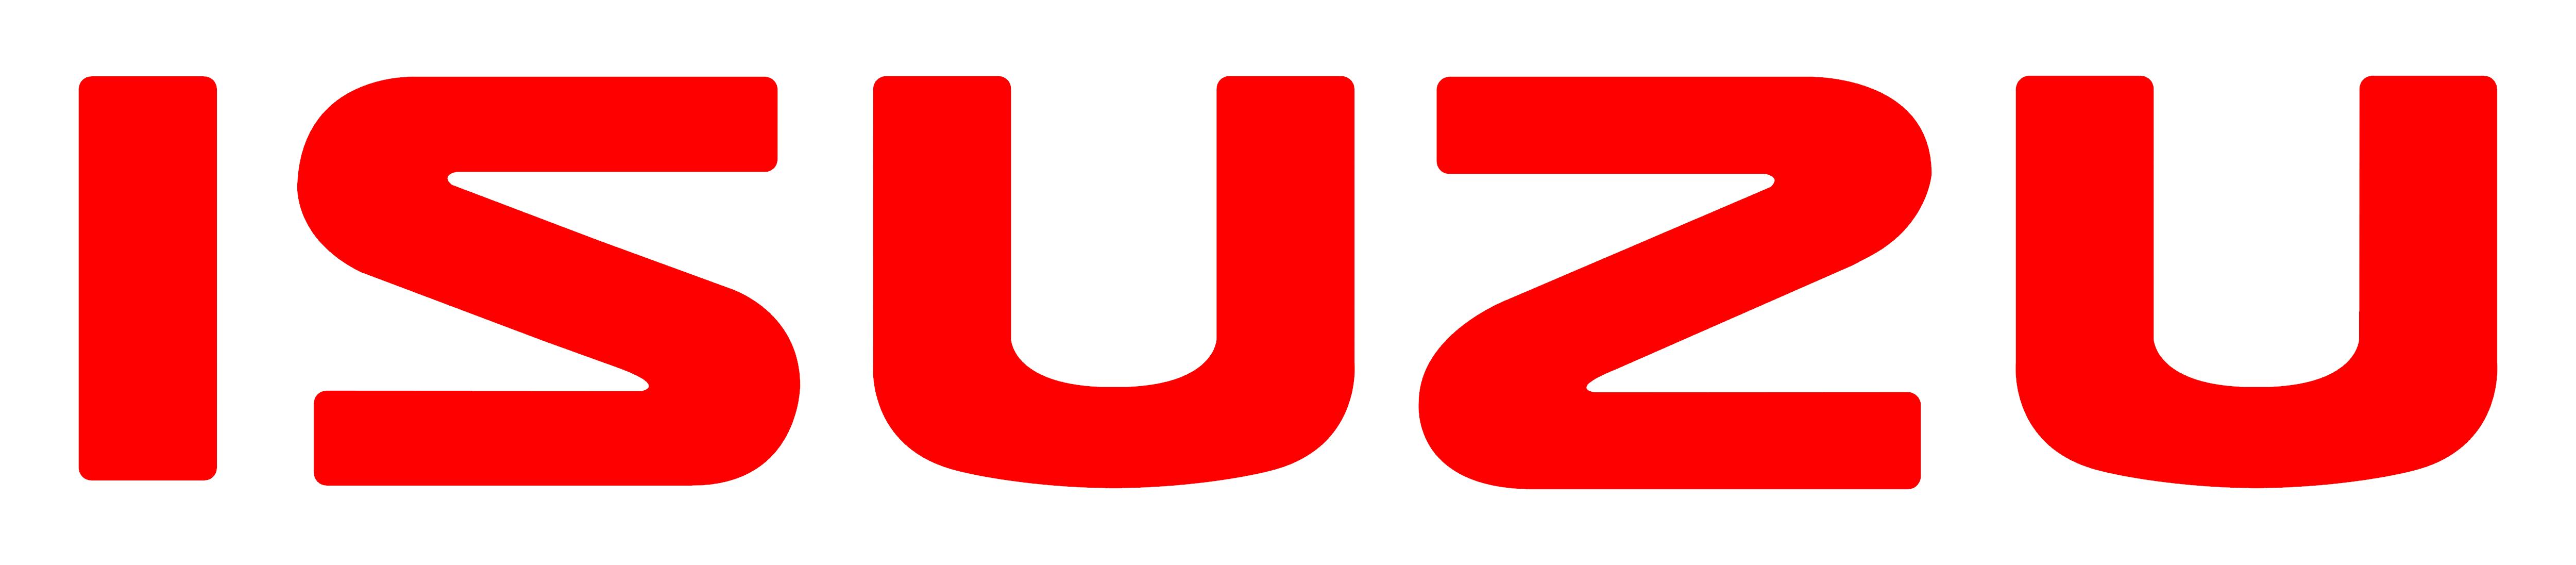 Isuzu Logos Download